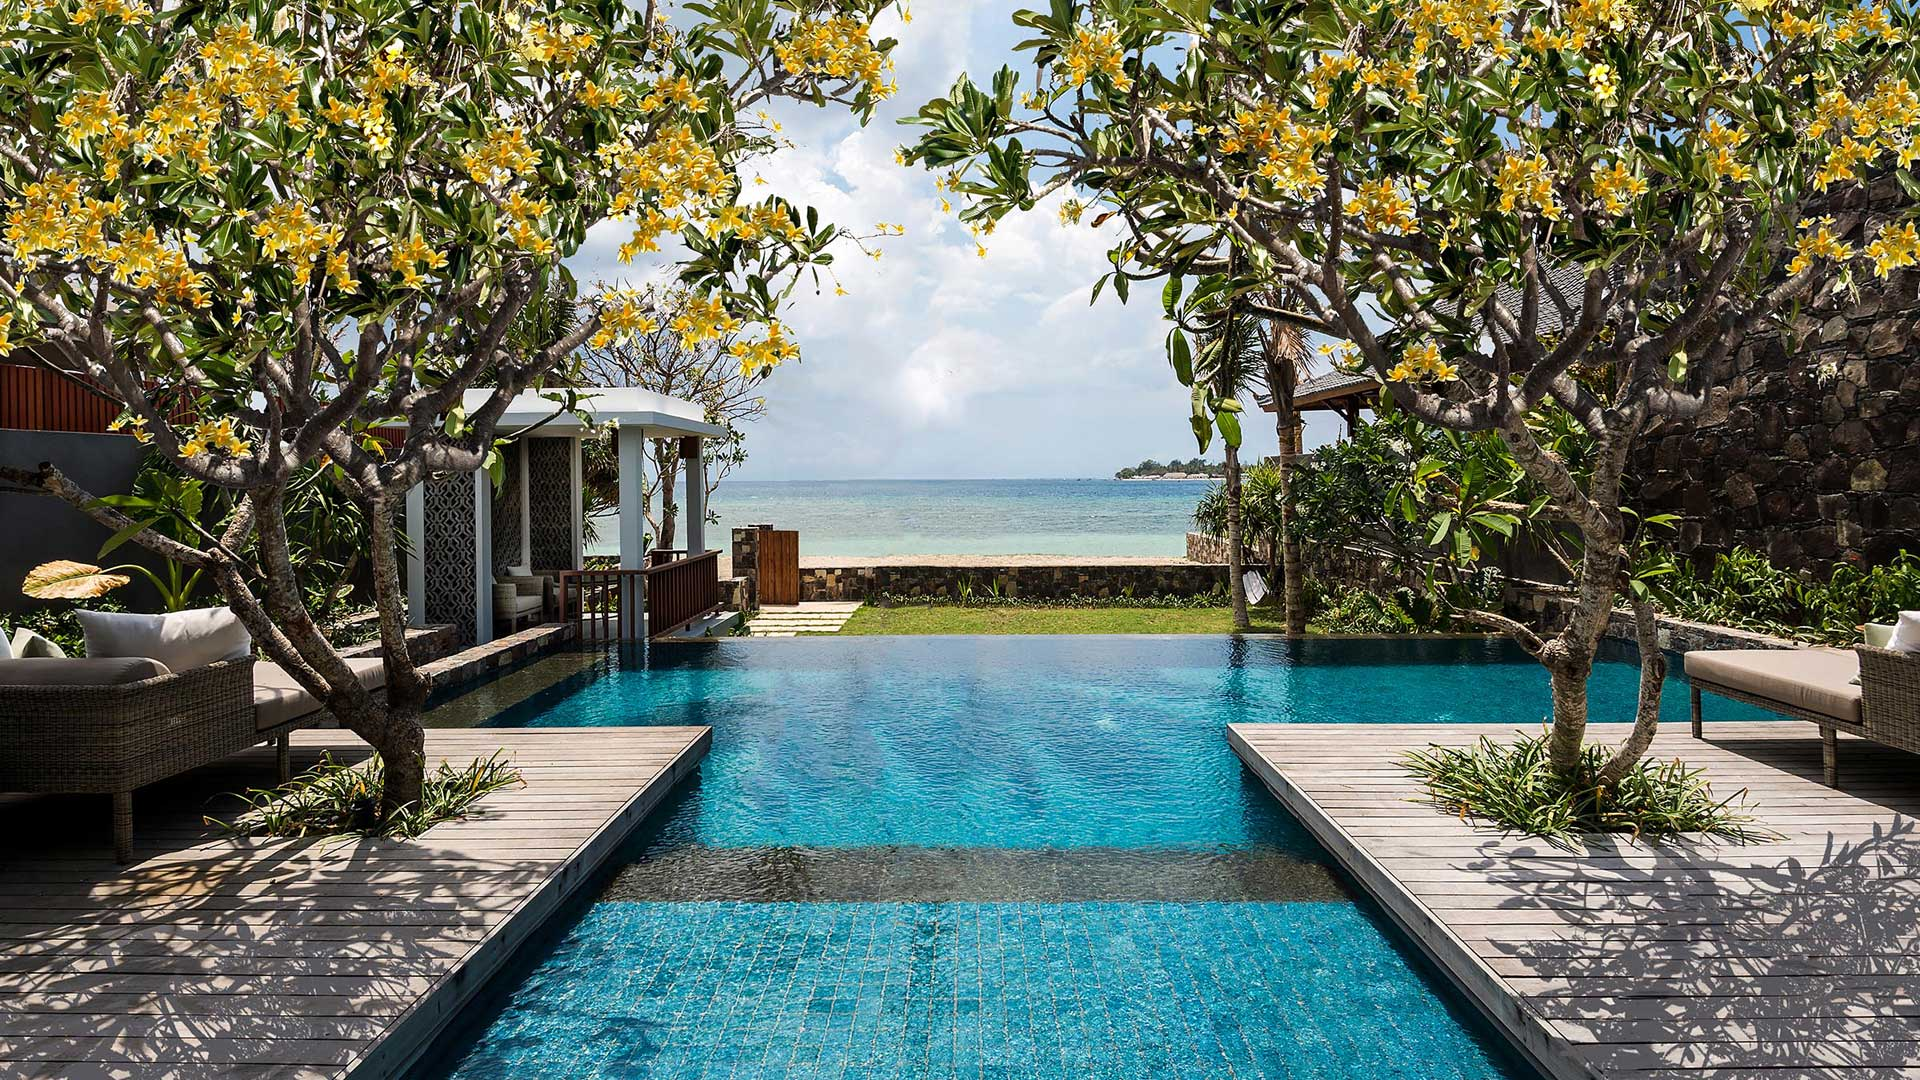 51397_the_legian_sire_lombok_beachfront_villa_view